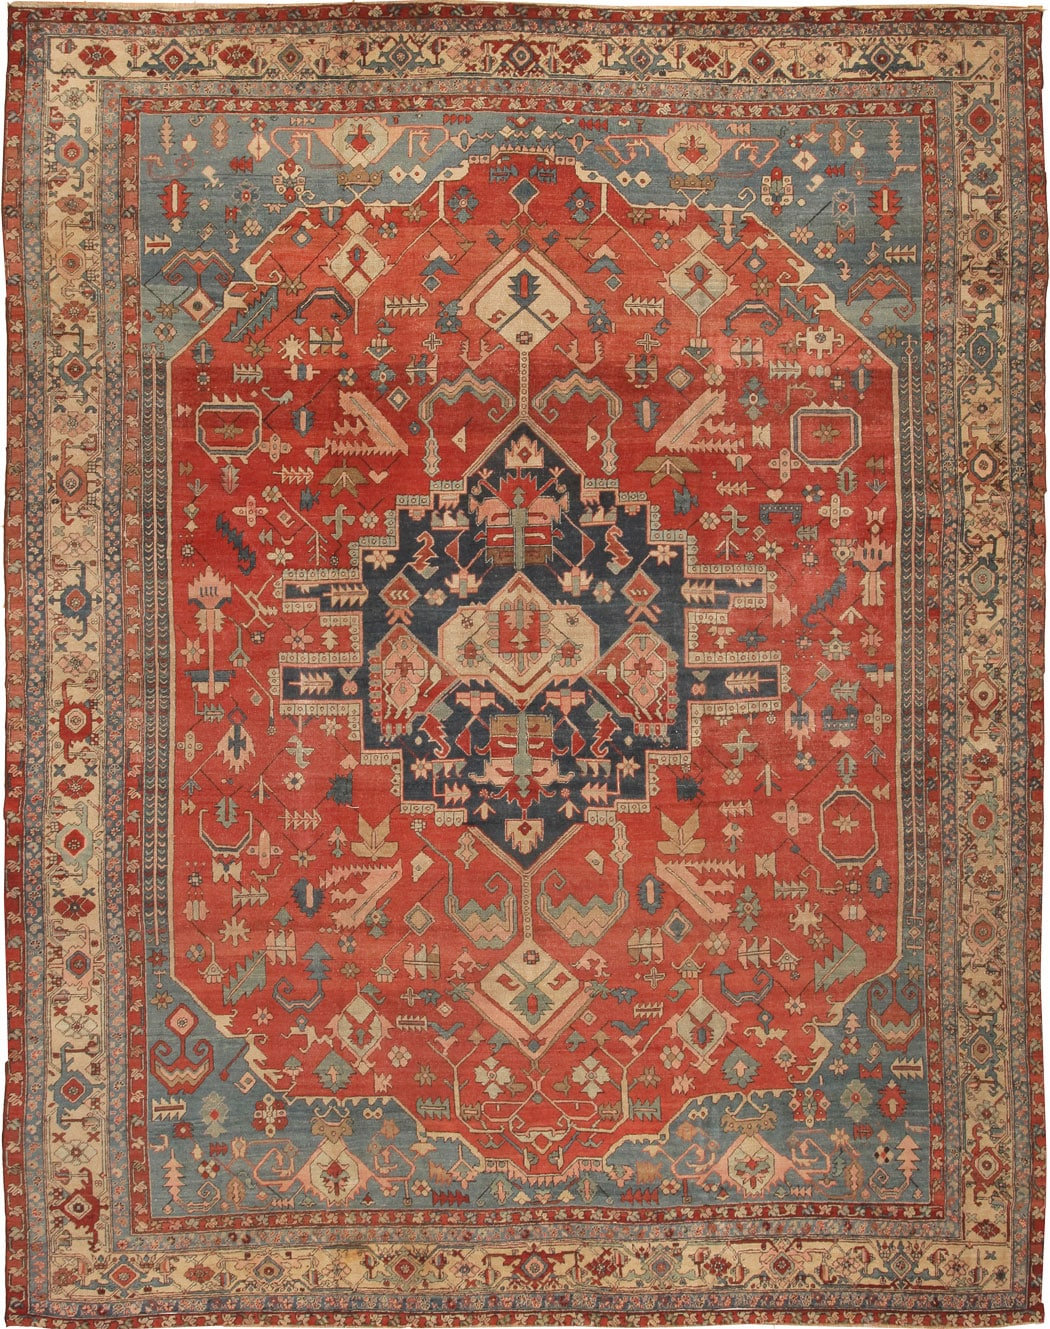 http://nazmiyalantiquerugs.com/wp-content/uploads/2011/03/43441-Antique-Heriz-Persian-Rug.jpg